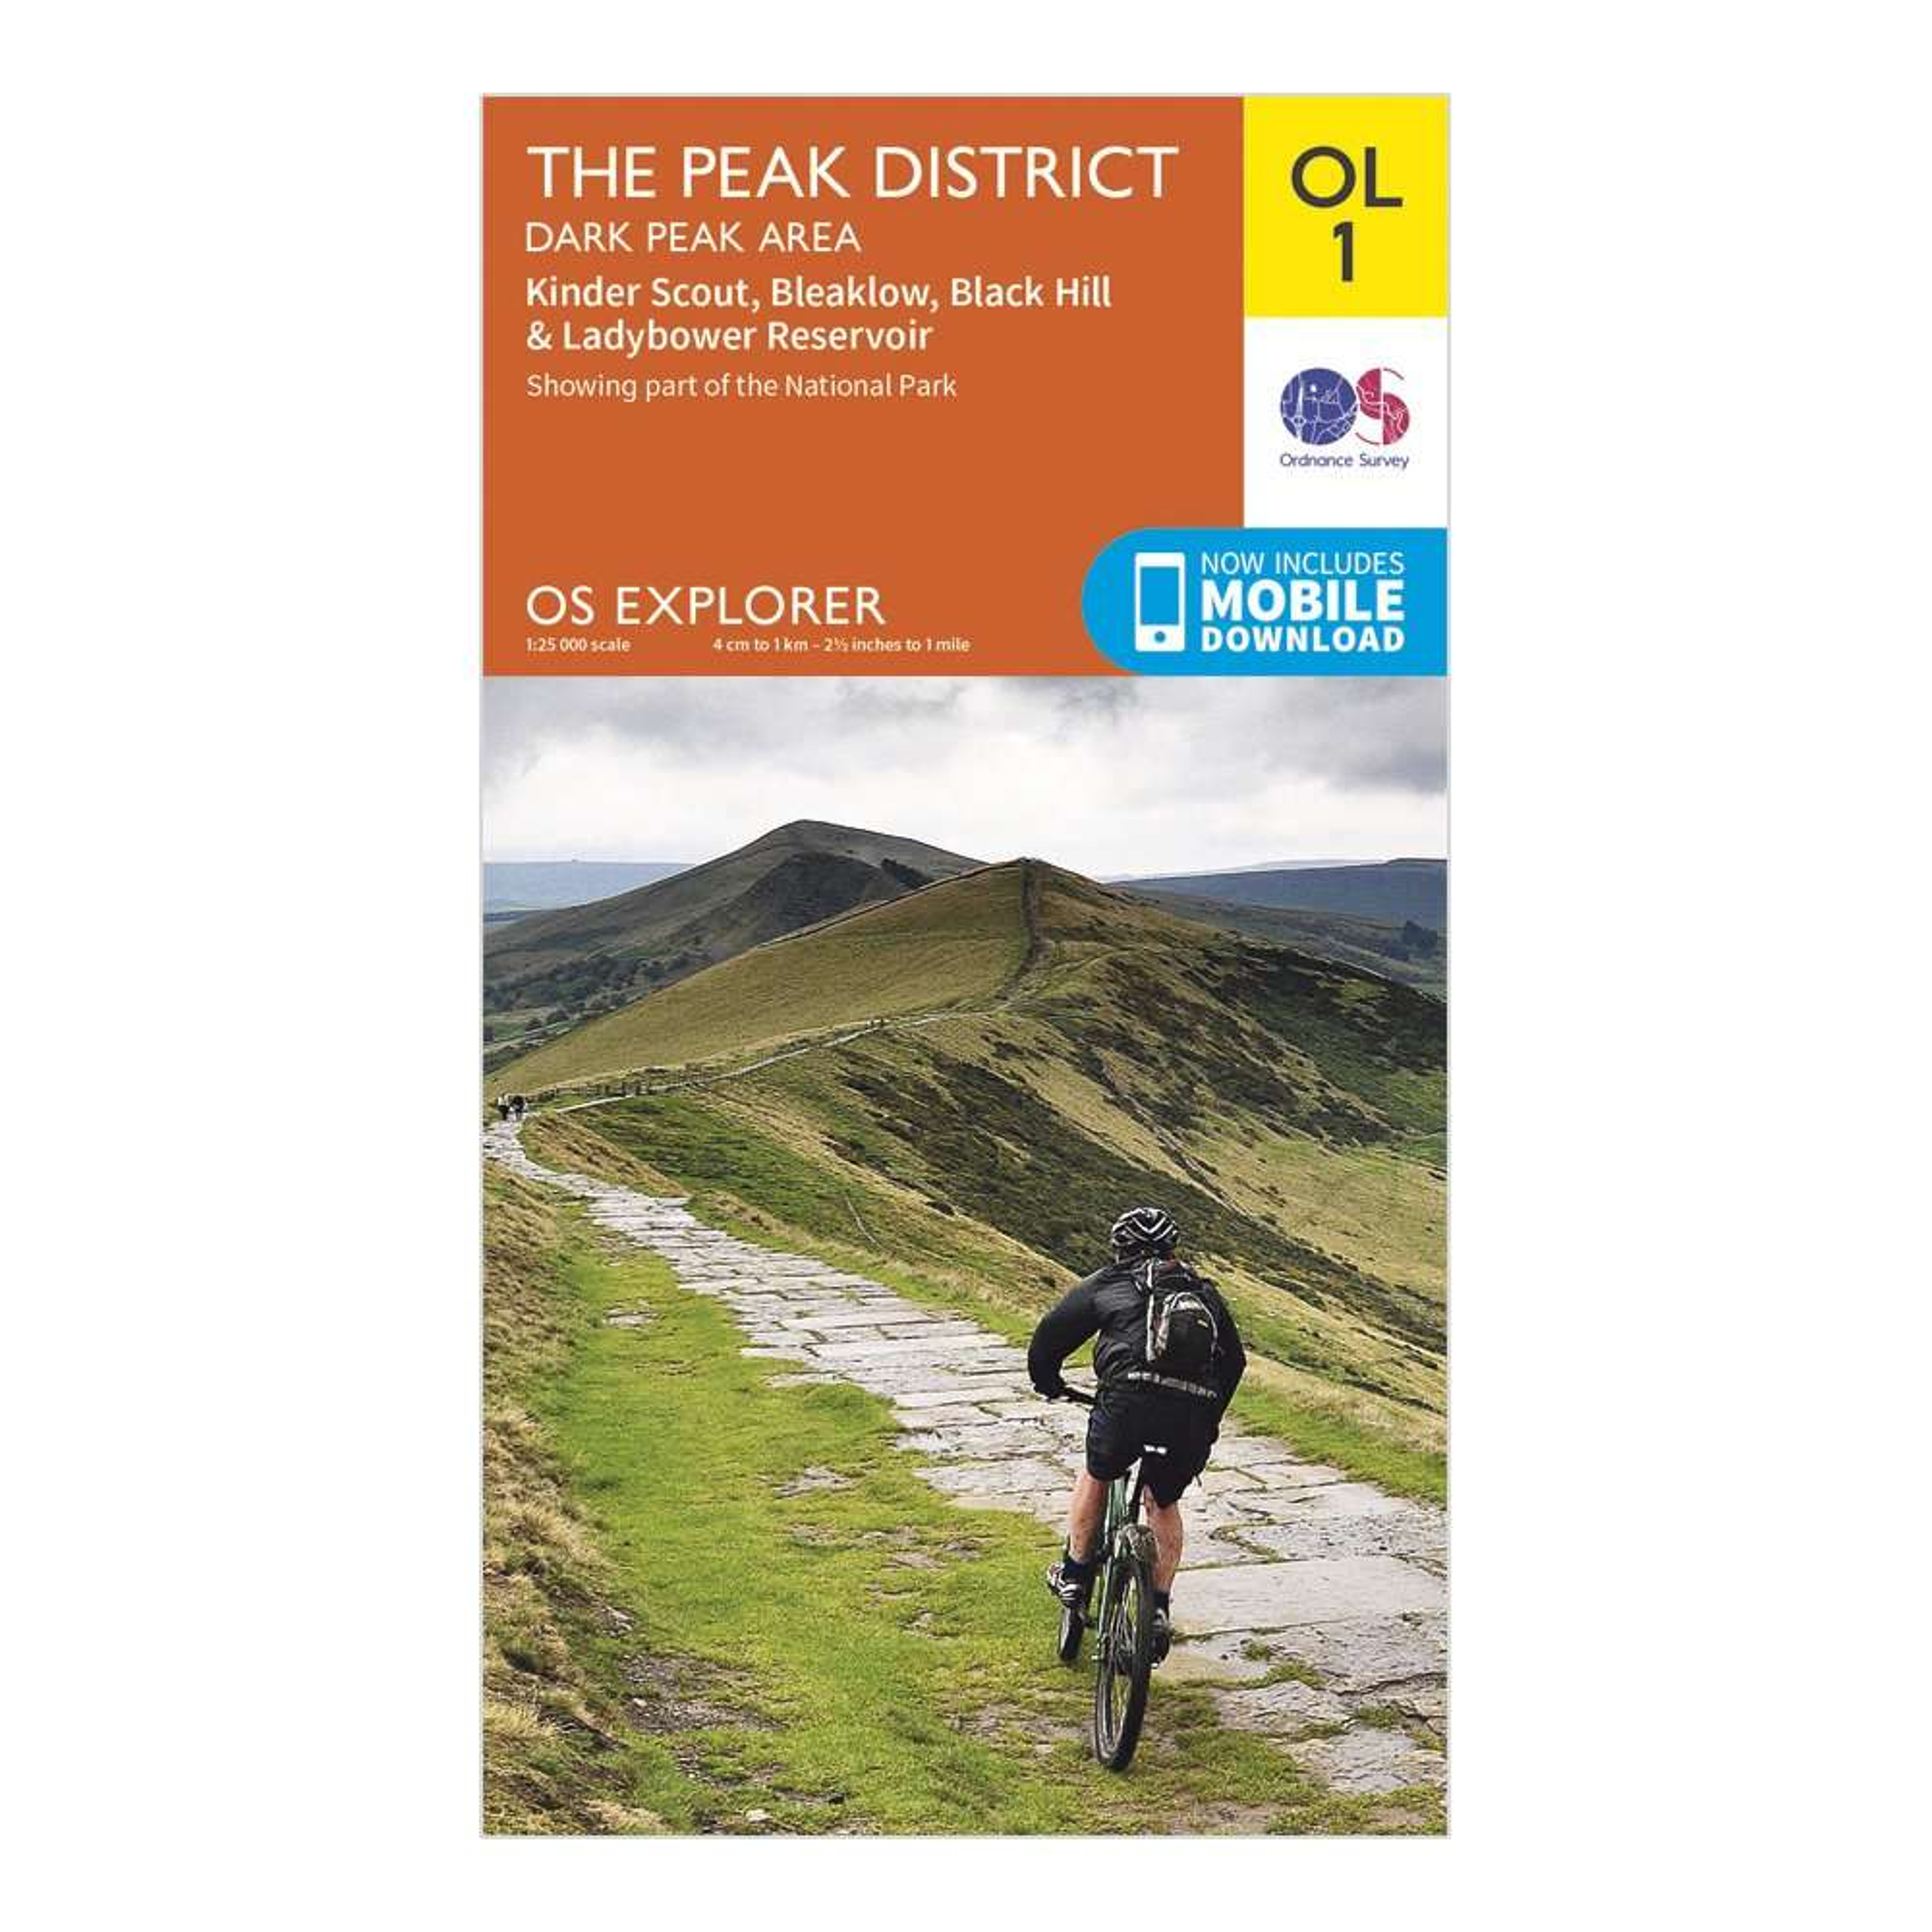 ORDNANCE SURVEY Explorer OL1 The Peak District - Dark Peak area With Digital Version